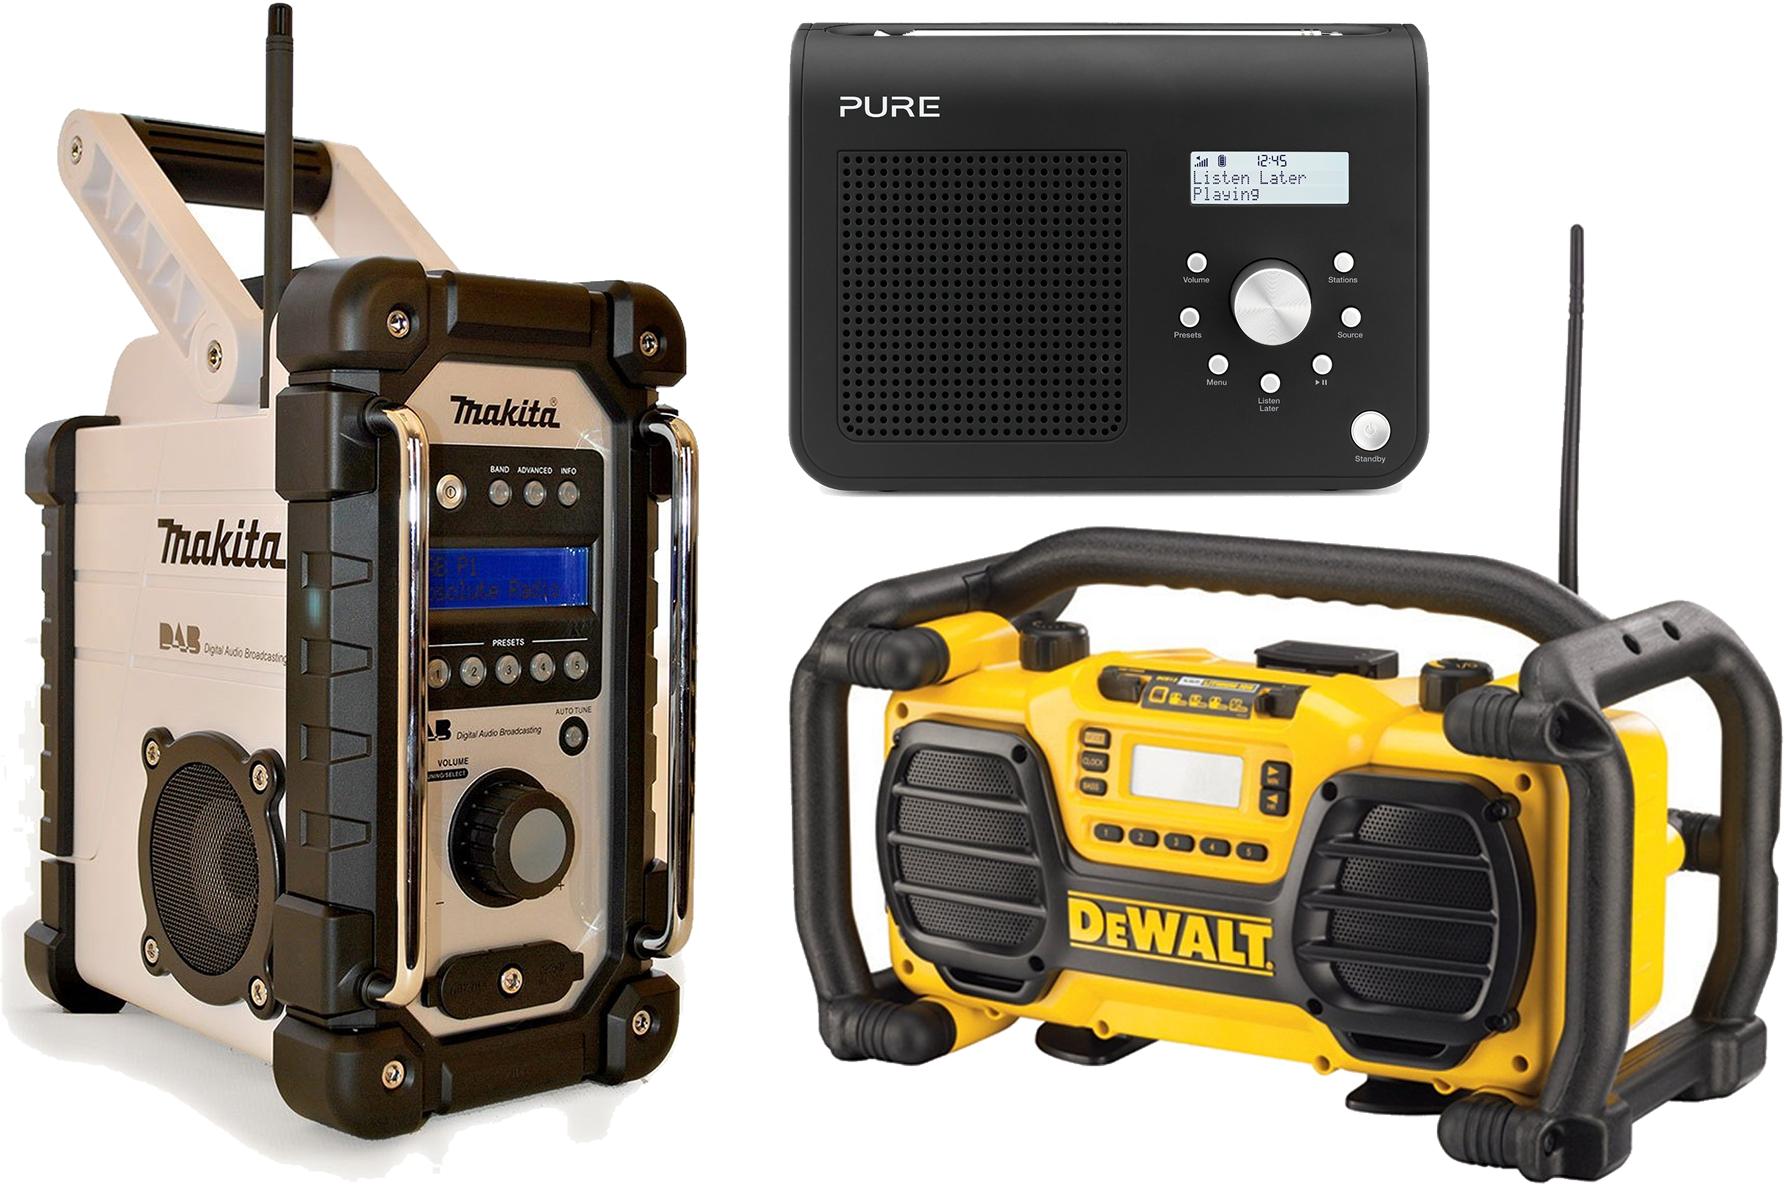 Plasterers Radios